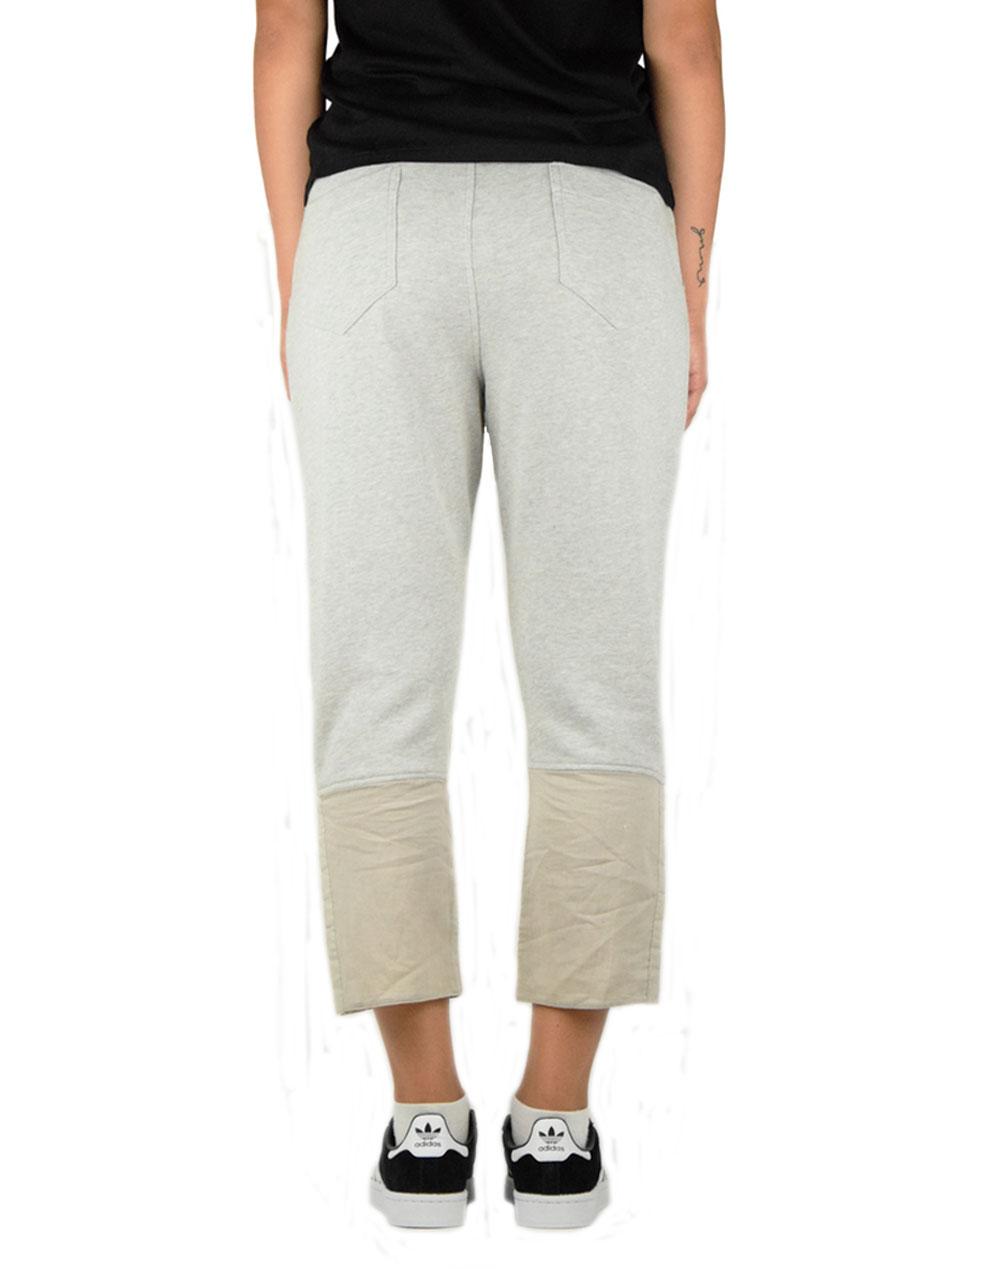 Diesel Phiffit Trousers Grey (00CFEJ-00FTD)